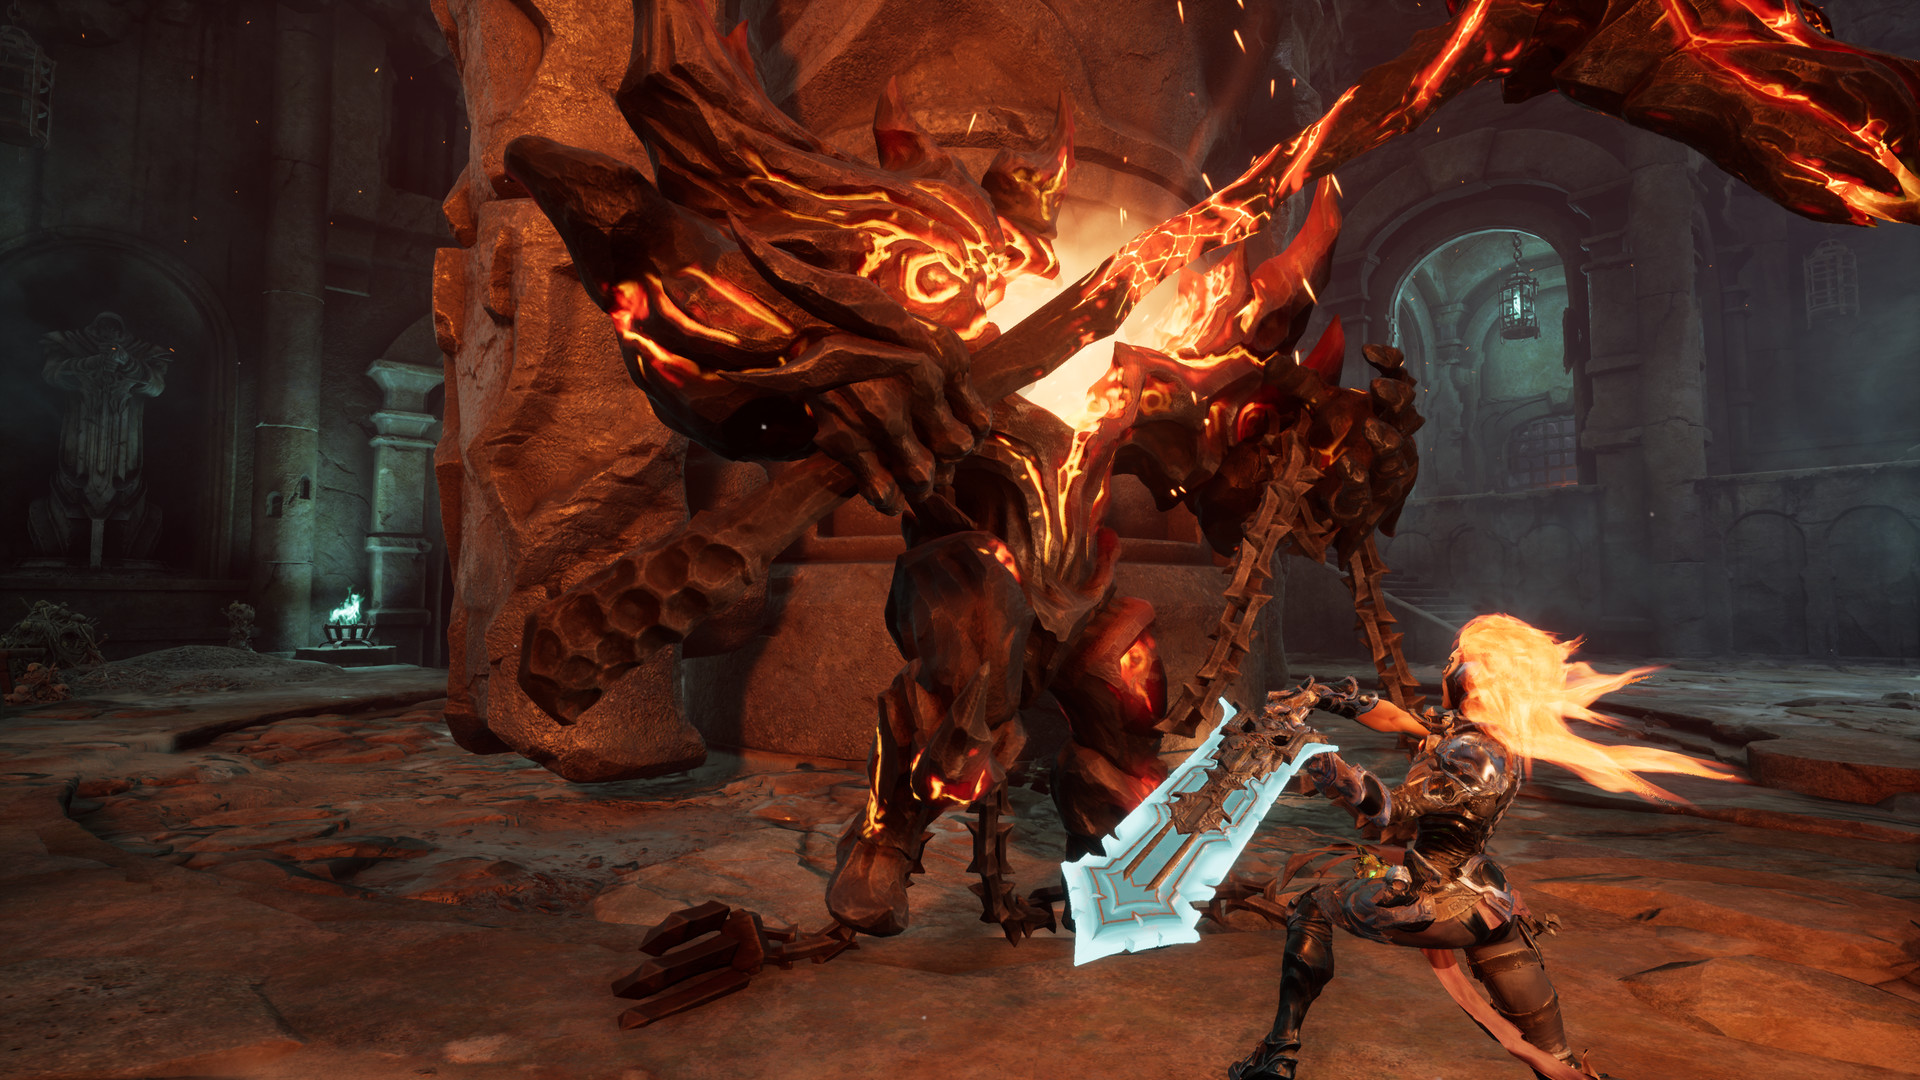 Darksiders III Screenshot 2